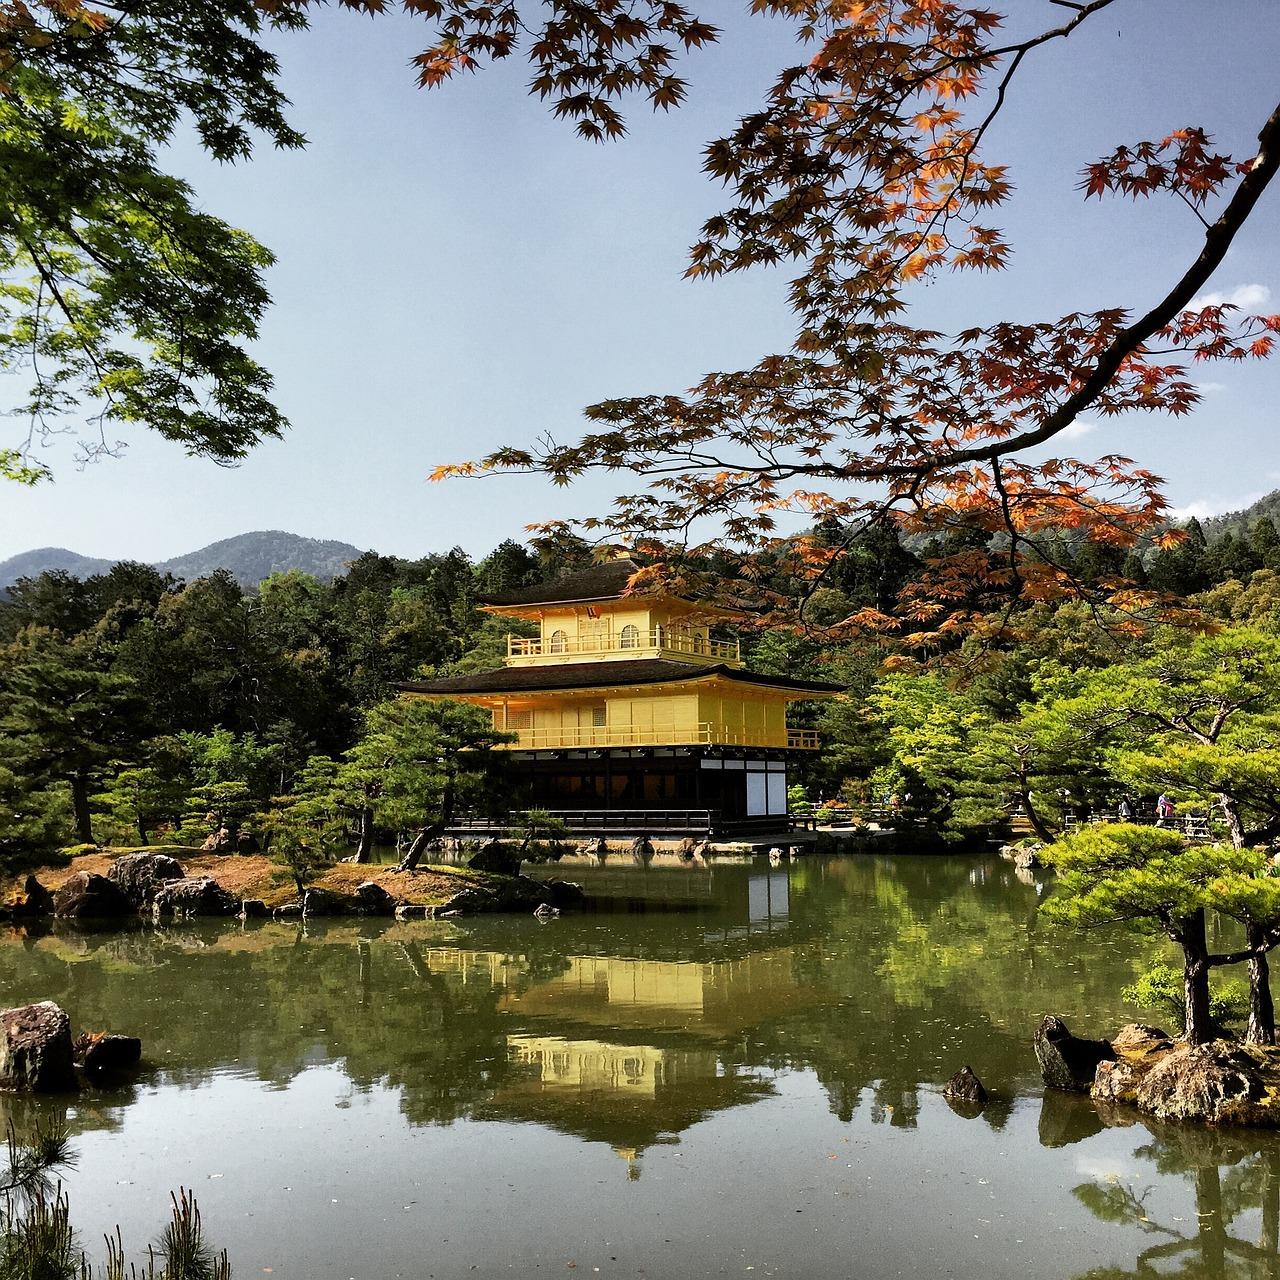 【 airbnb 】京都市、「民泊」指導入ります!「民泊」に対し旅館業法の許可取得を指導へ